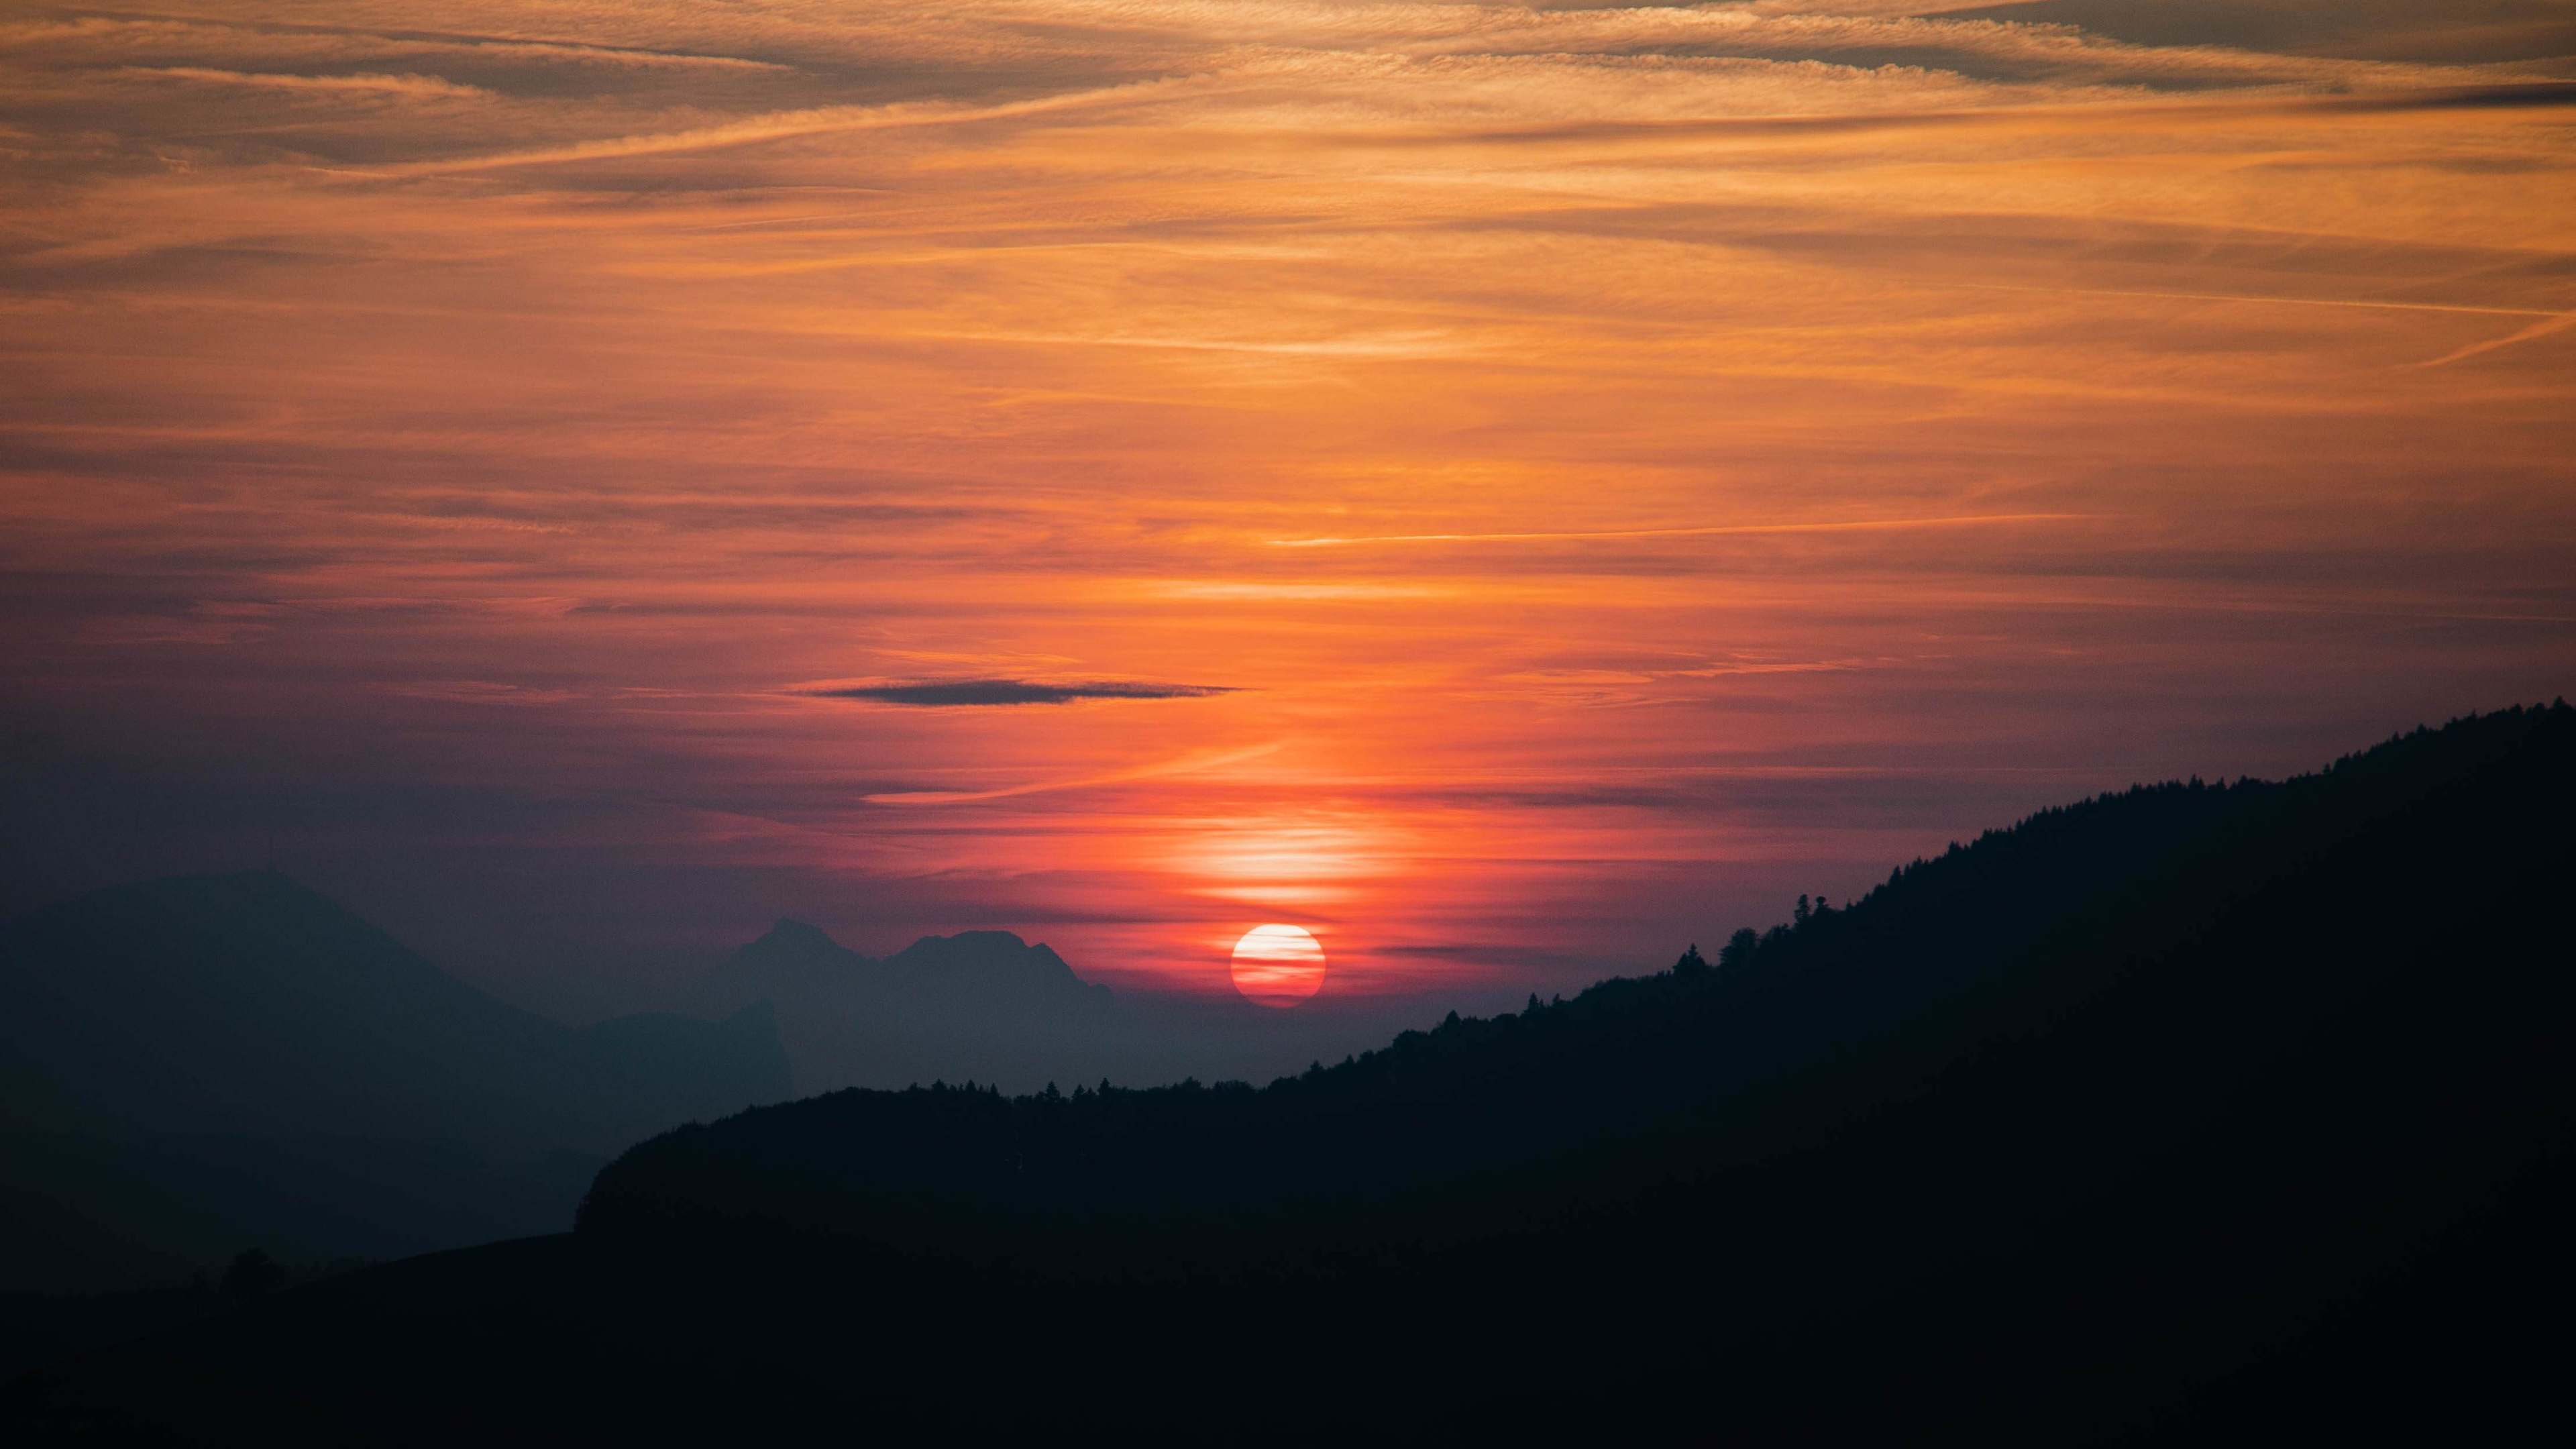 sunset 4k 1551644051 - Sunset 4k - sunset wallpapers, nature wallpapers, hd-wallpapers, 4k-wallpapers